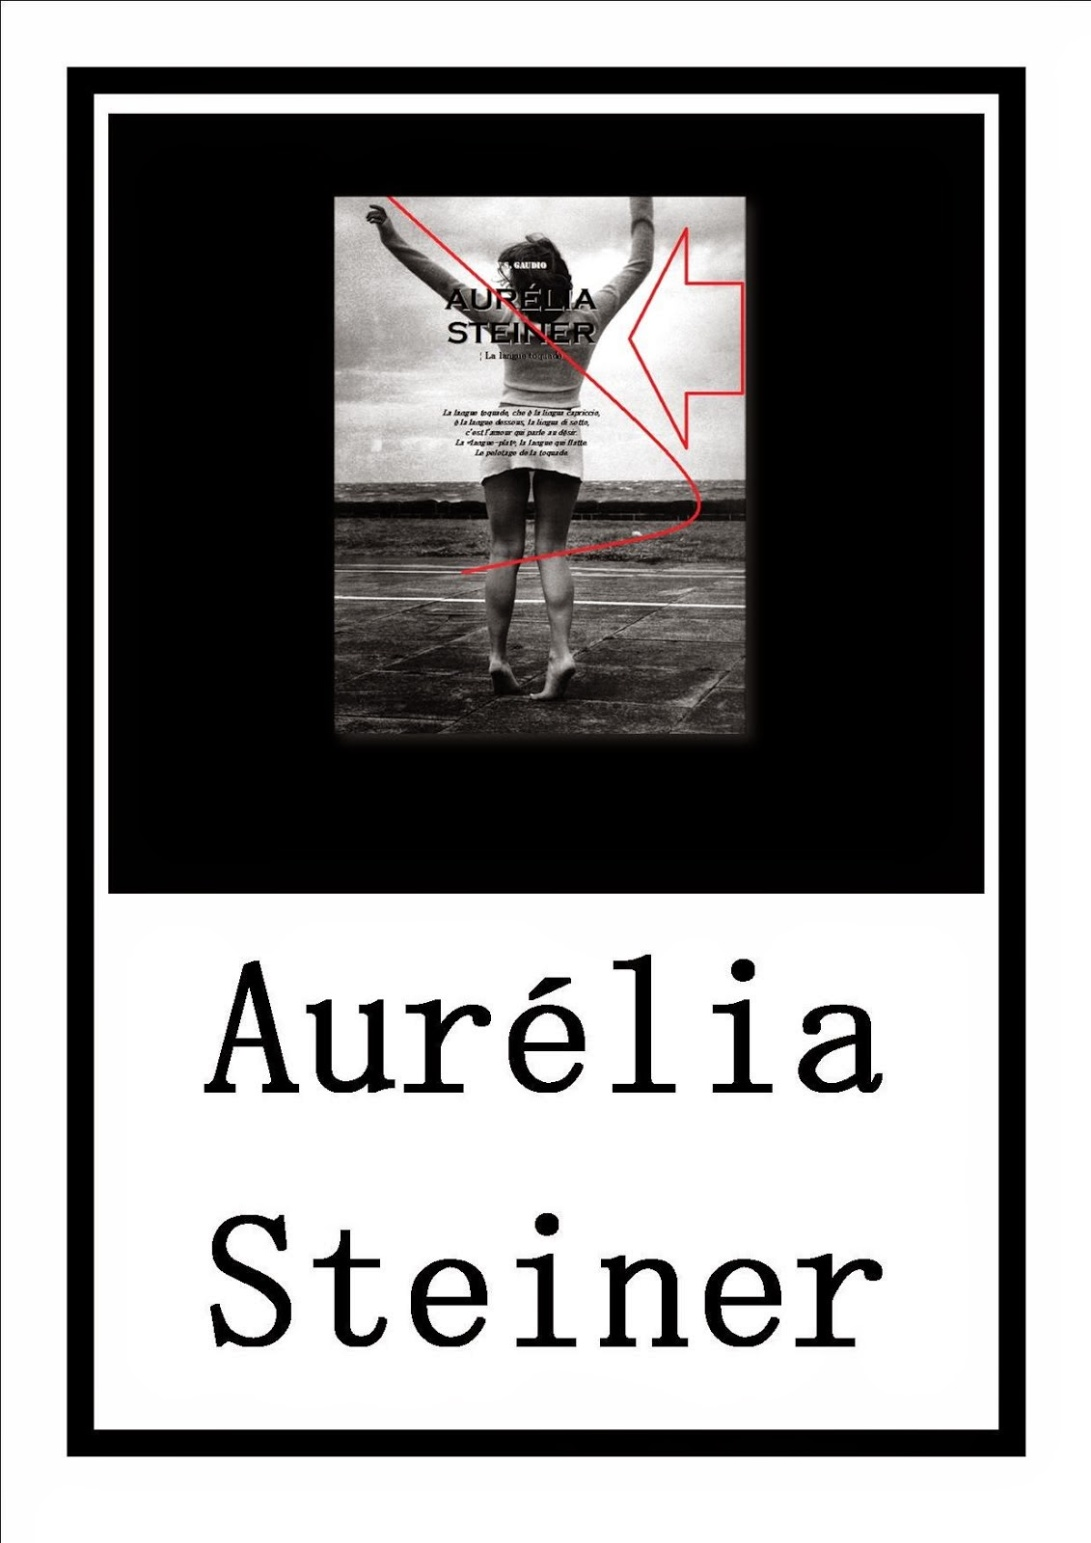 AURELIA STEINER ♦ A. J. Pedregoso ♦ Aurélia K. Mynought ♦ A. J. Stone ♦ A. de la Piedra